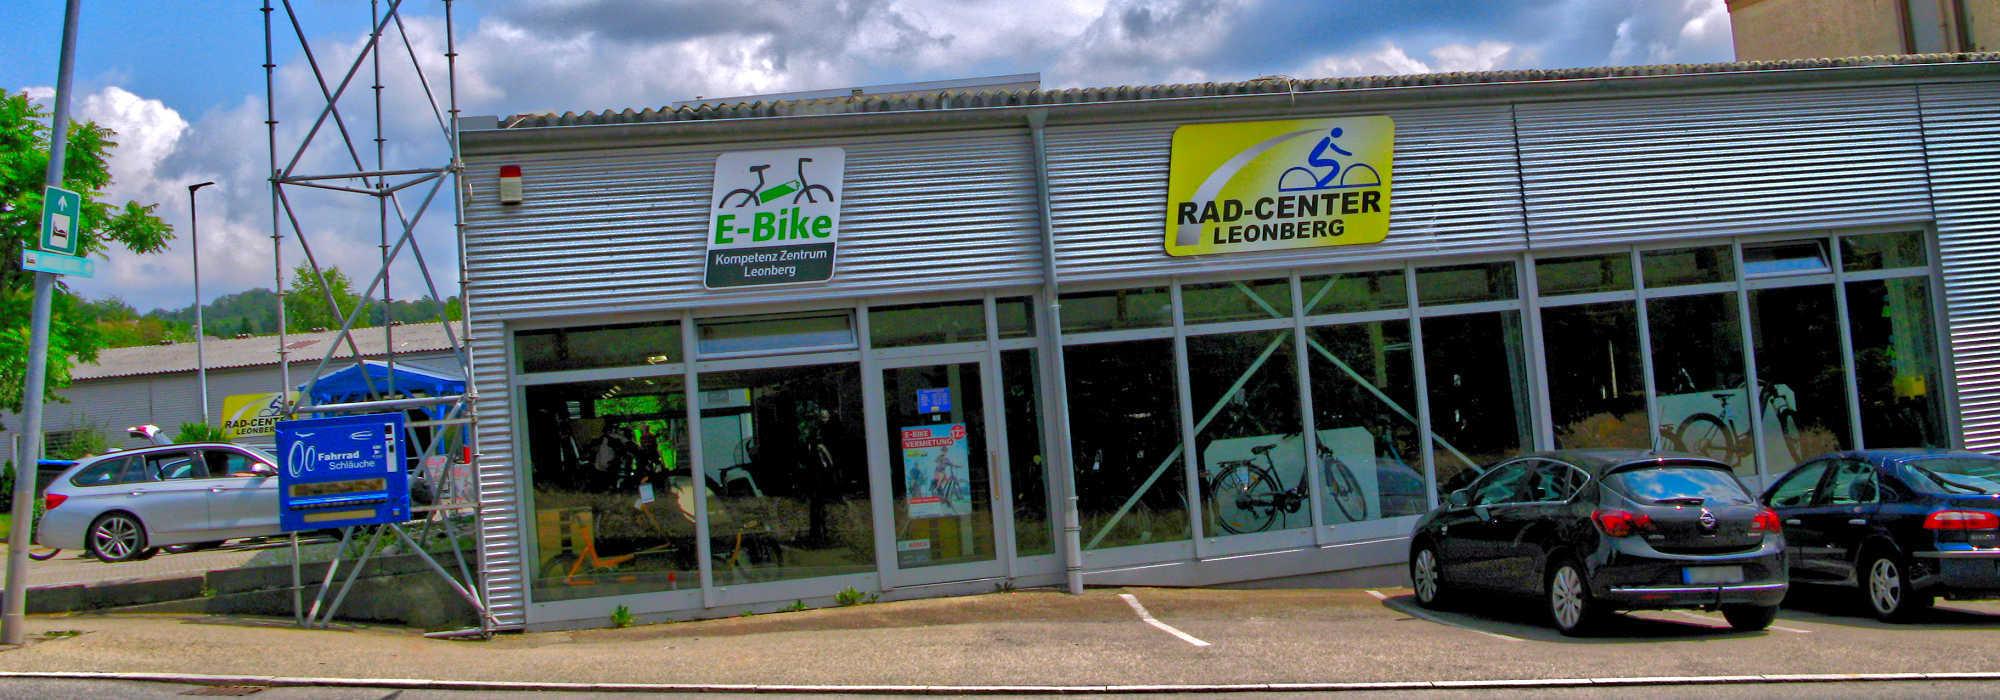 E-Bike und Radcenter Leonberg